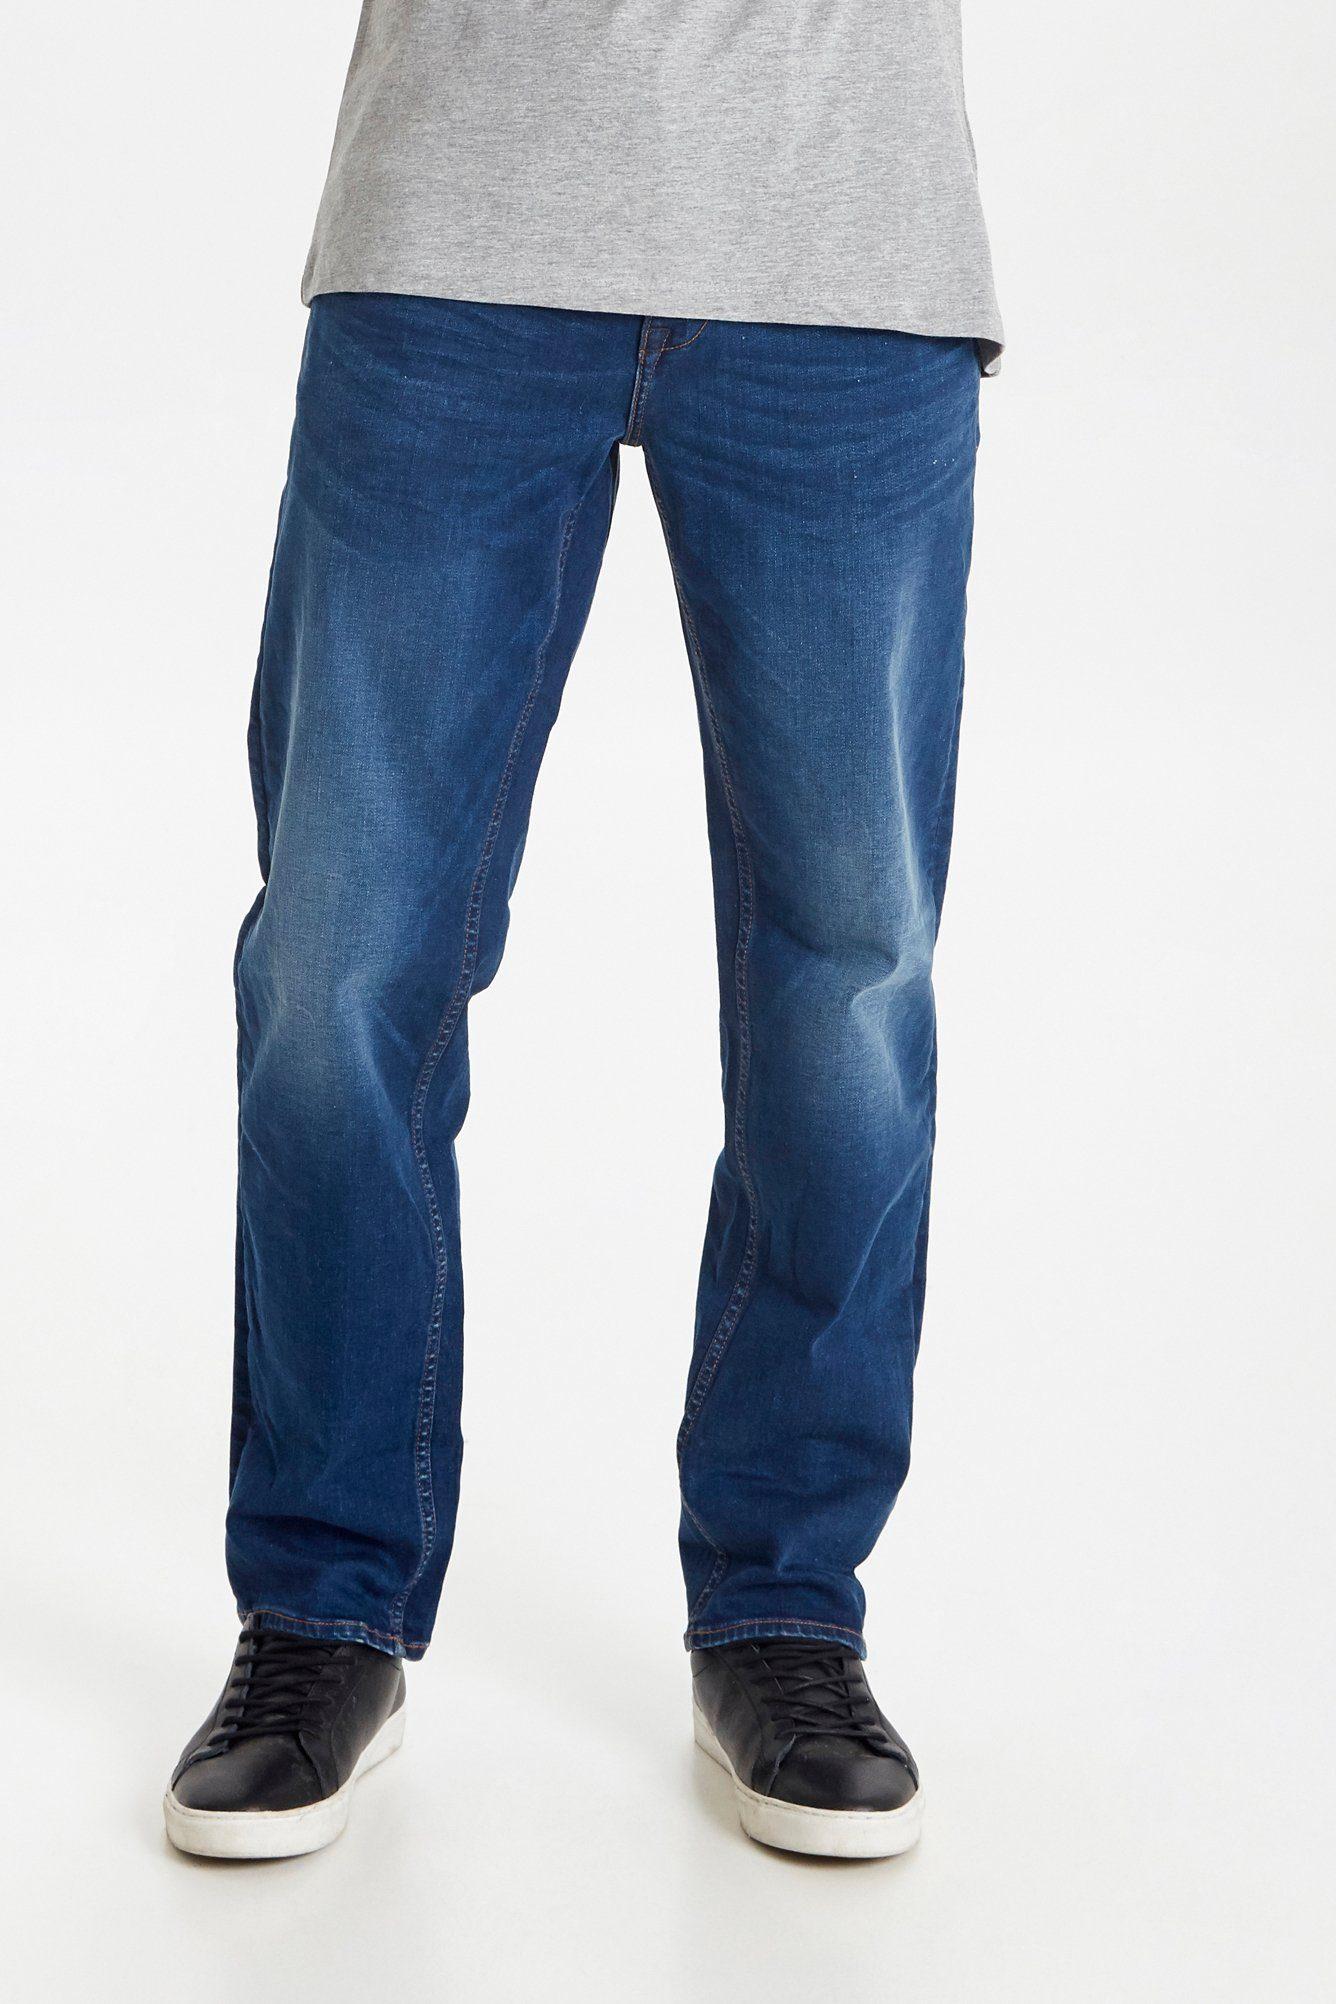 Blend Stretch-Jeans Modell Chill Regular-fit/ normale Form | Bekleidung > Jeans > Stretch Jeans | Blau | Denim - Jeans | Blend